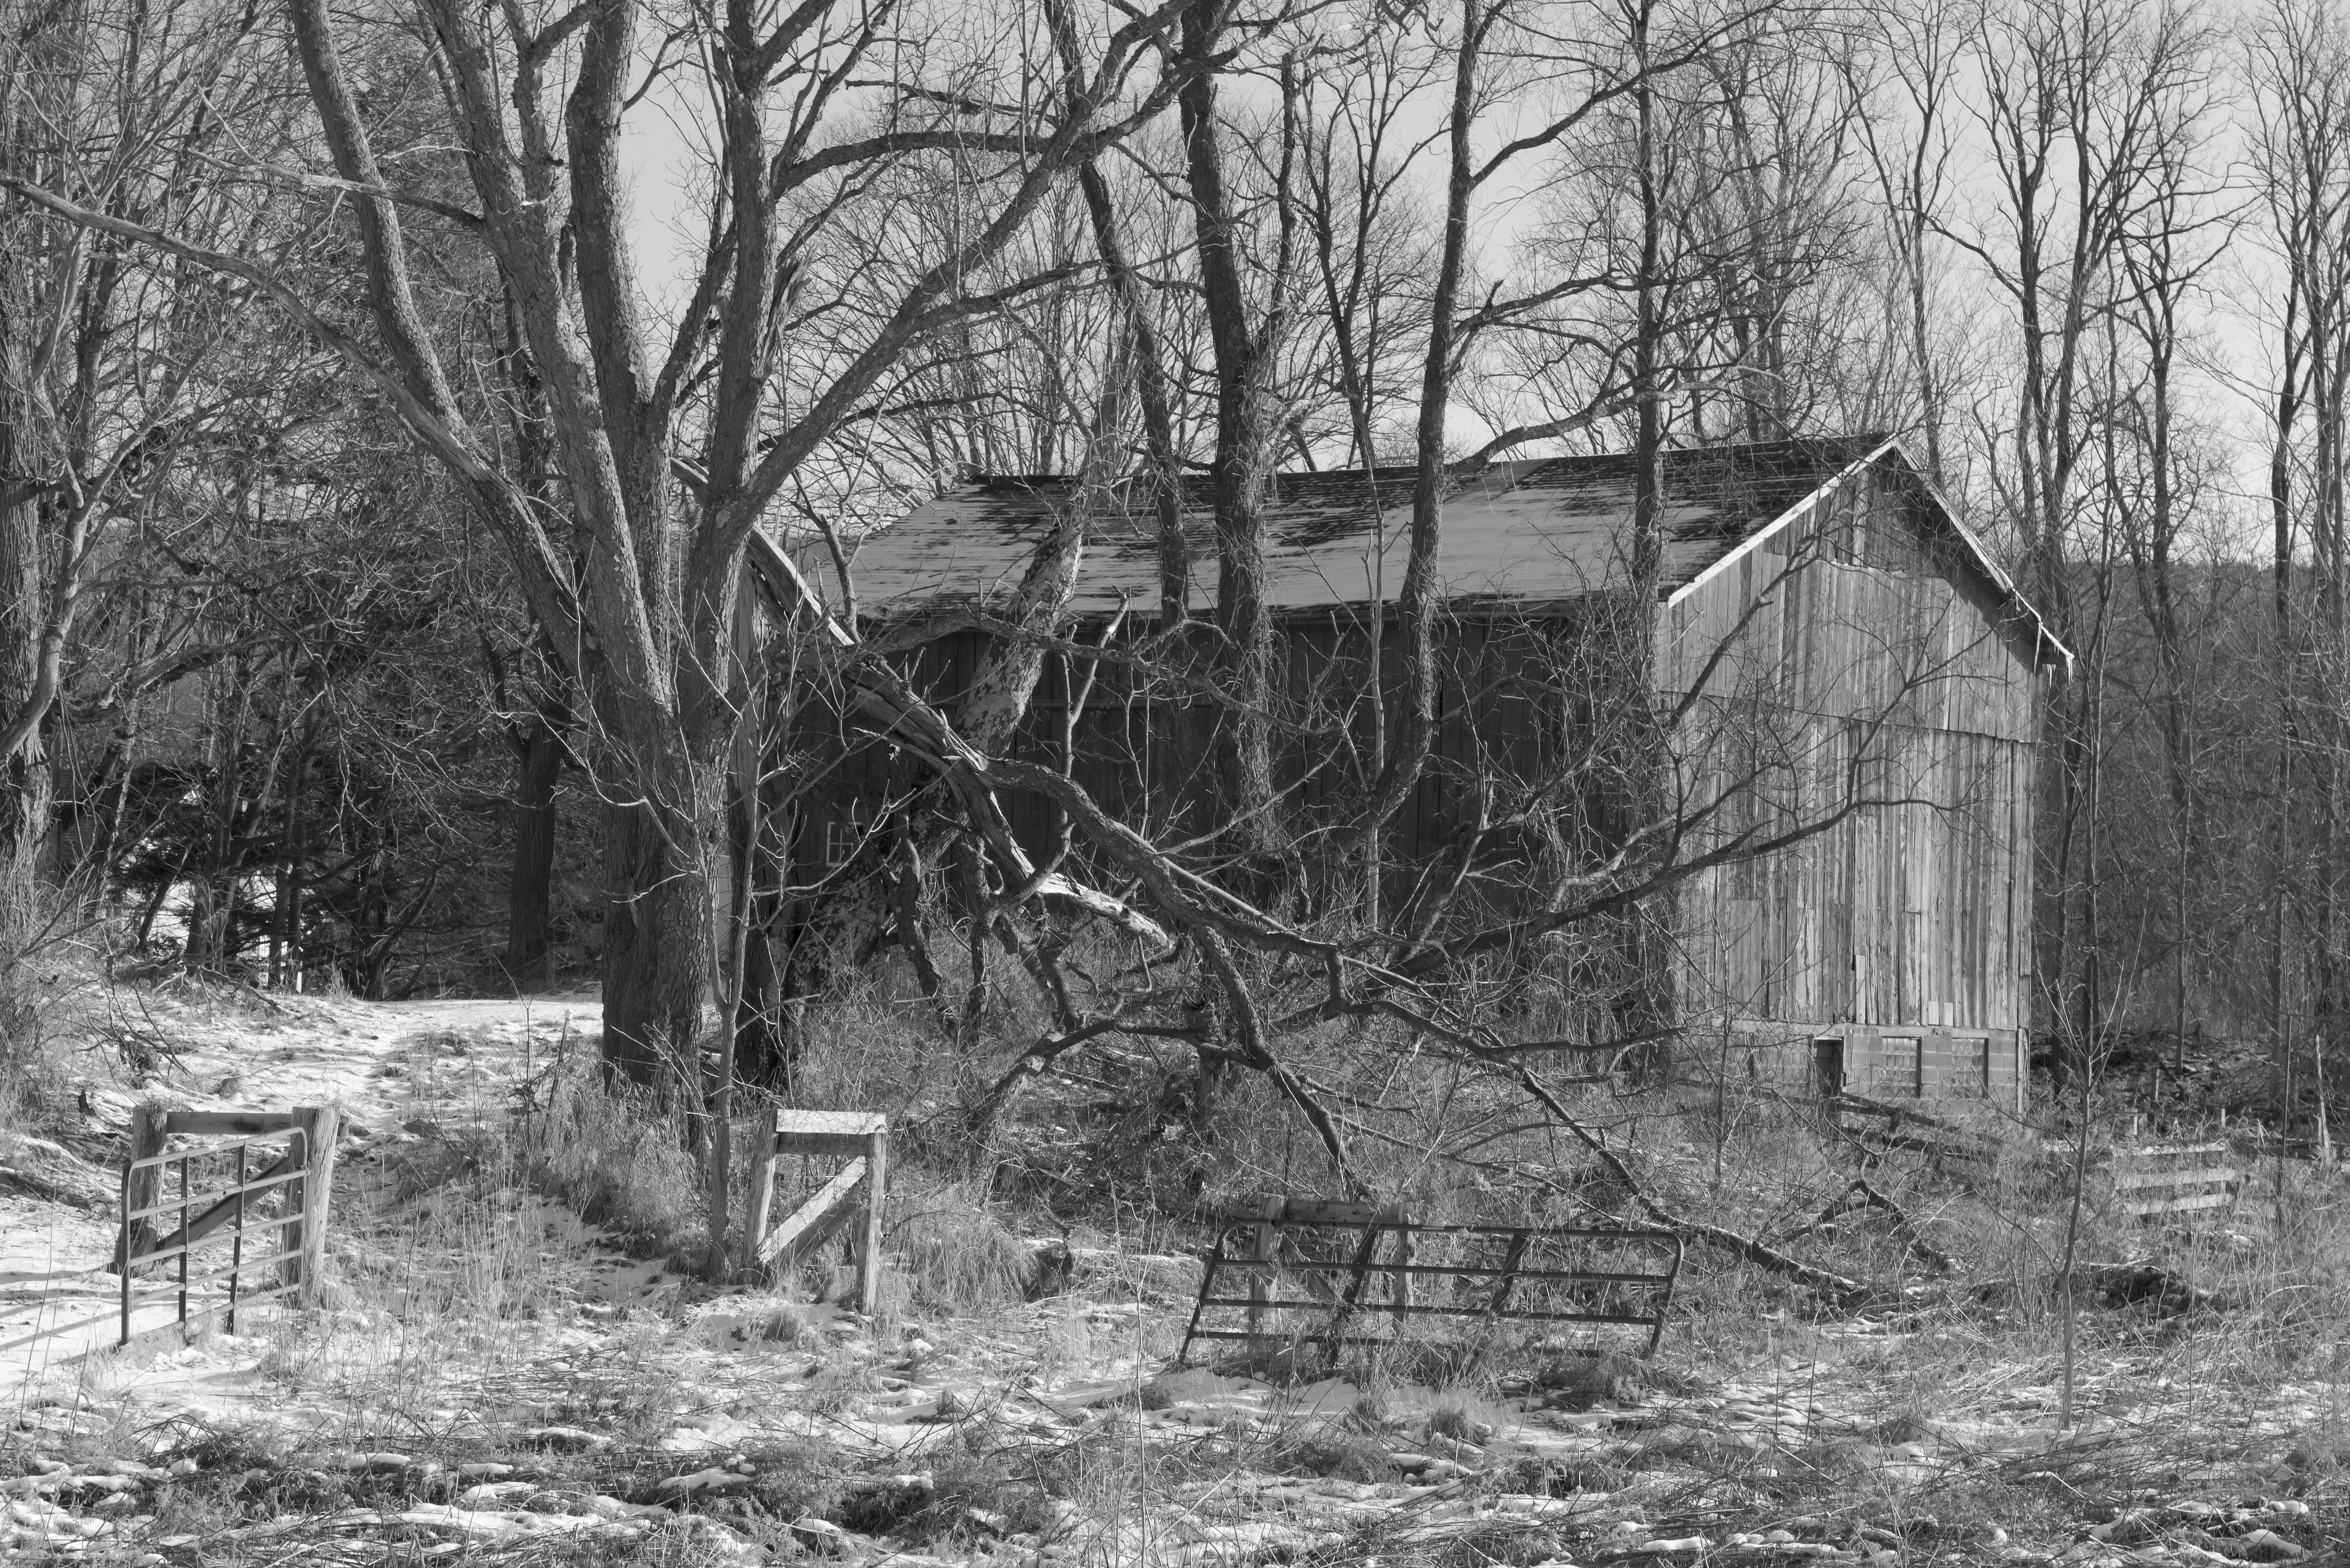 Danby Barn